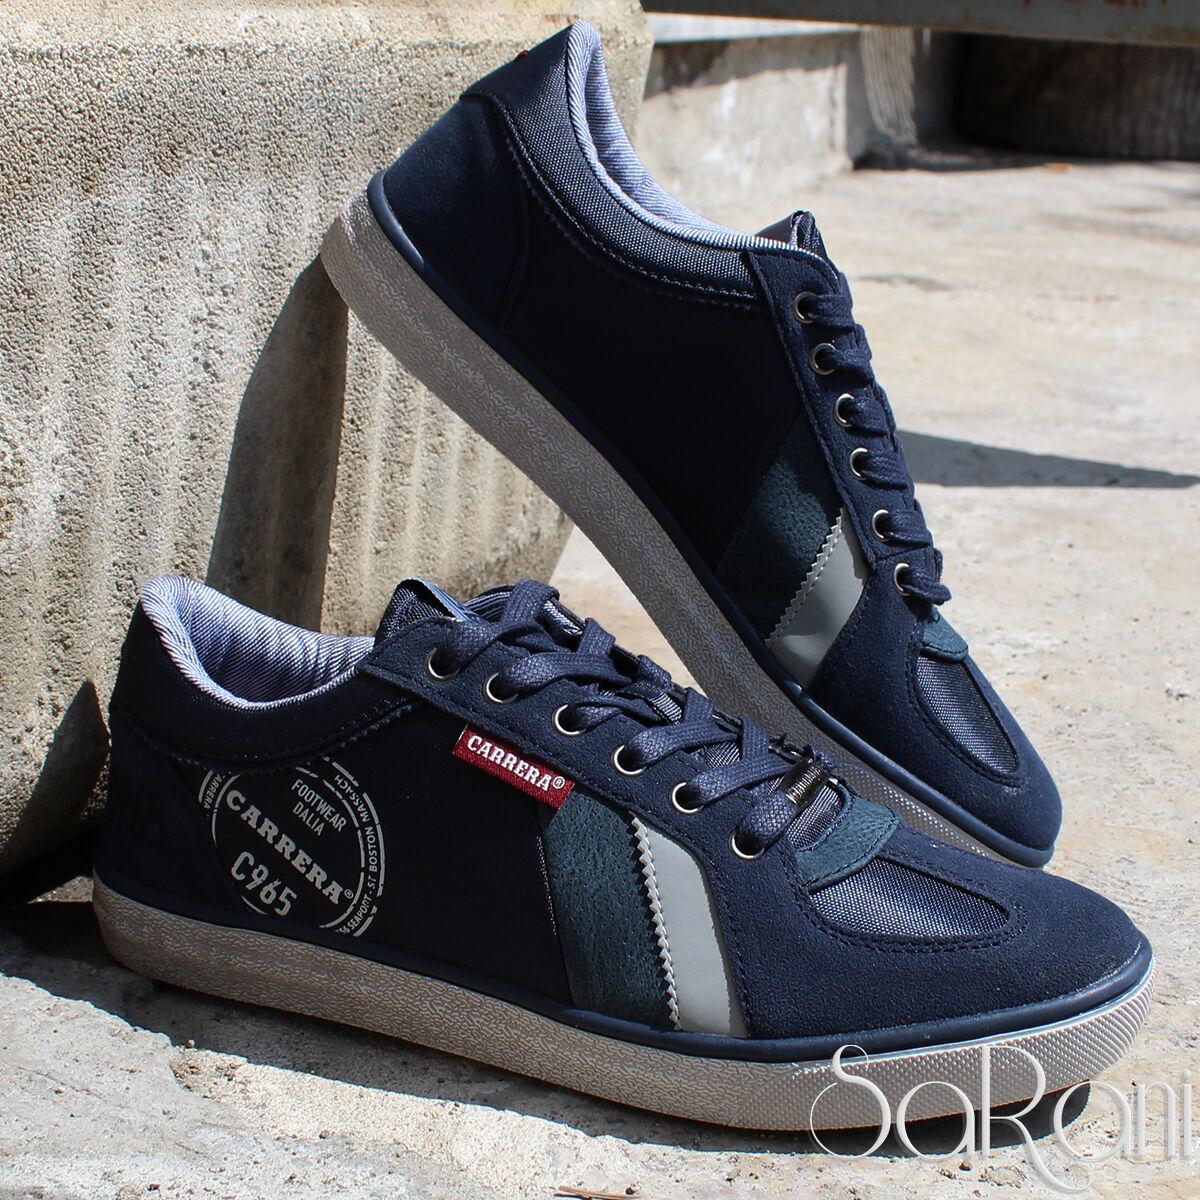 shoes men Carrera Sneakers Basse blue Sportive Camoscio Lacci Stringhe SARANI